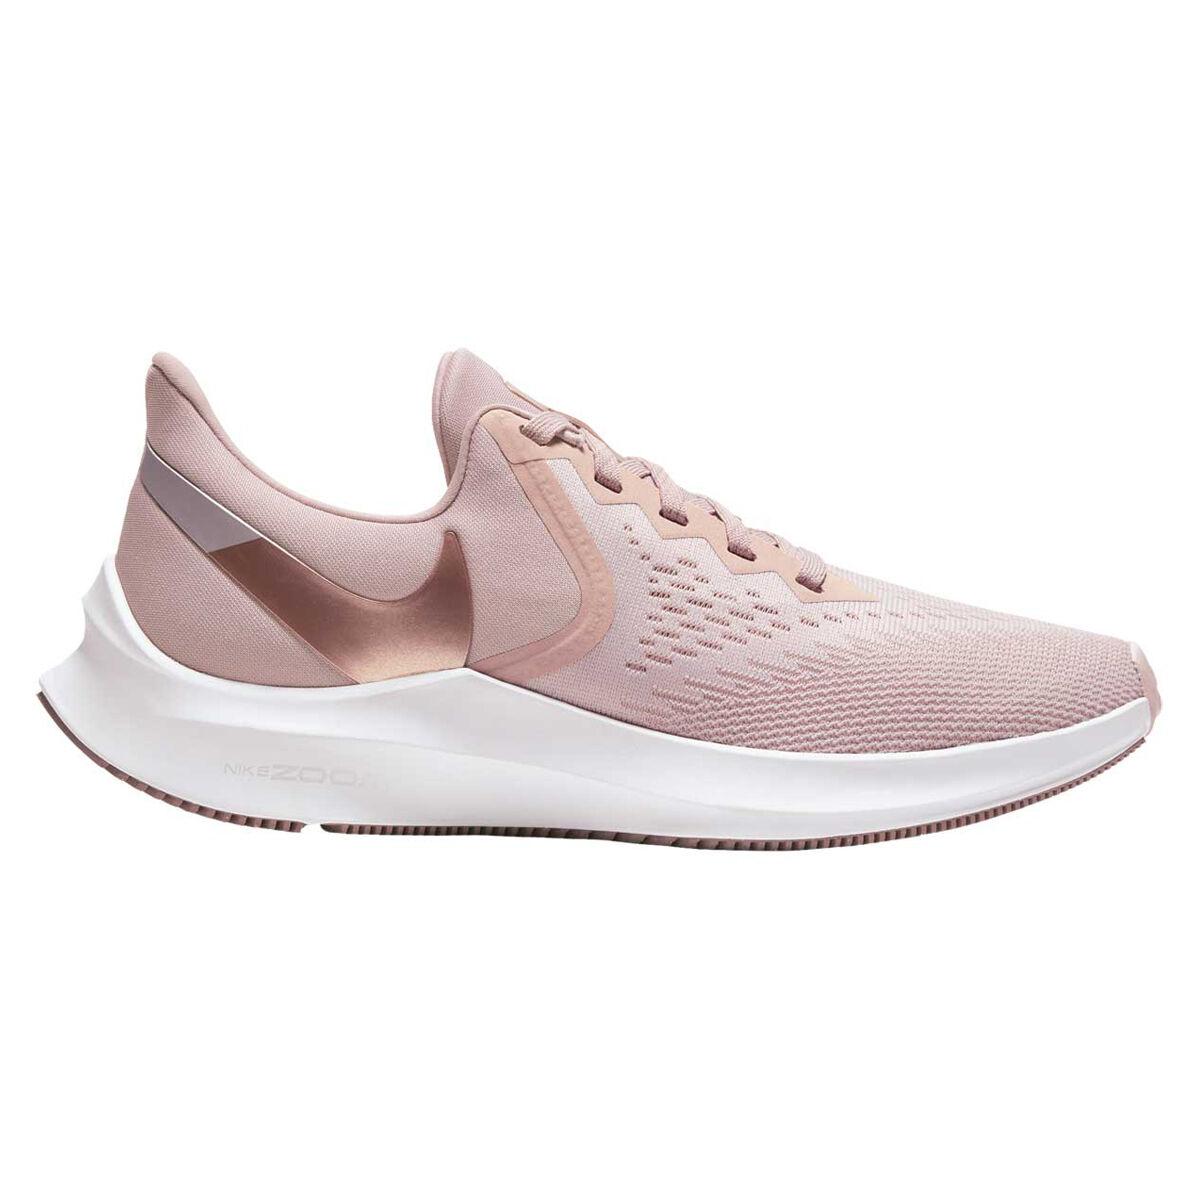 Nike Air Zoom Winflo 6 Women's Running Shoes